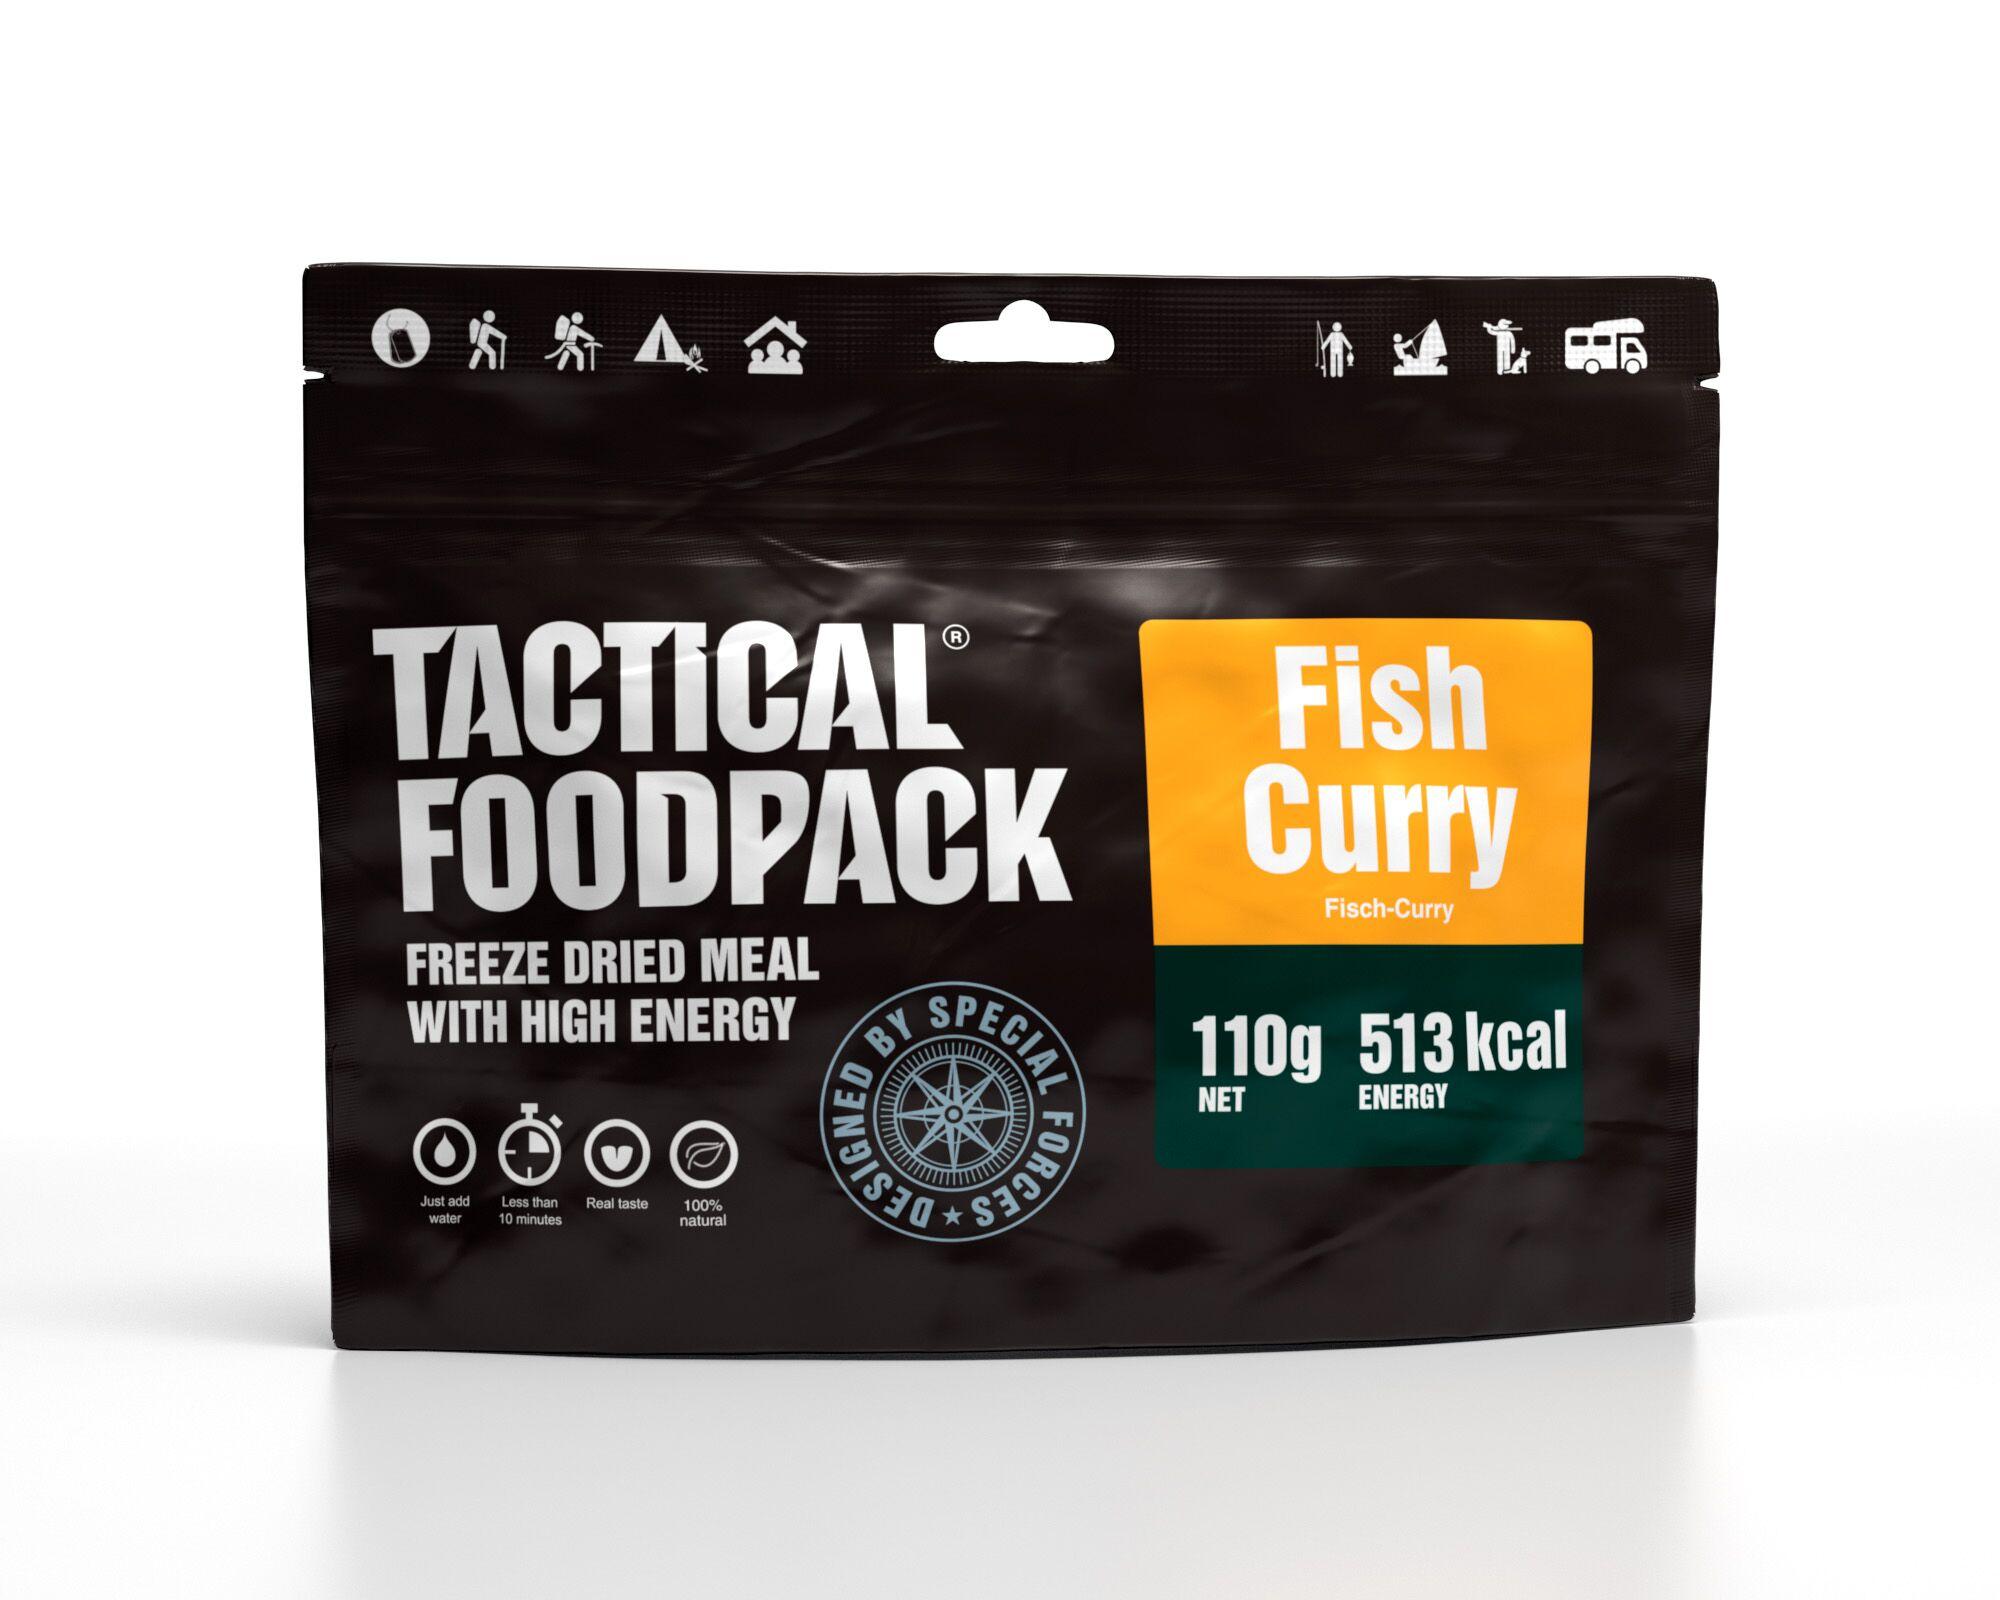 Dehidrirana hrana Tactical Foodpack - Fish Curry , B33 army shop at www.opremljen.si, trgovina z vojaško opremo, vojaška trgovina